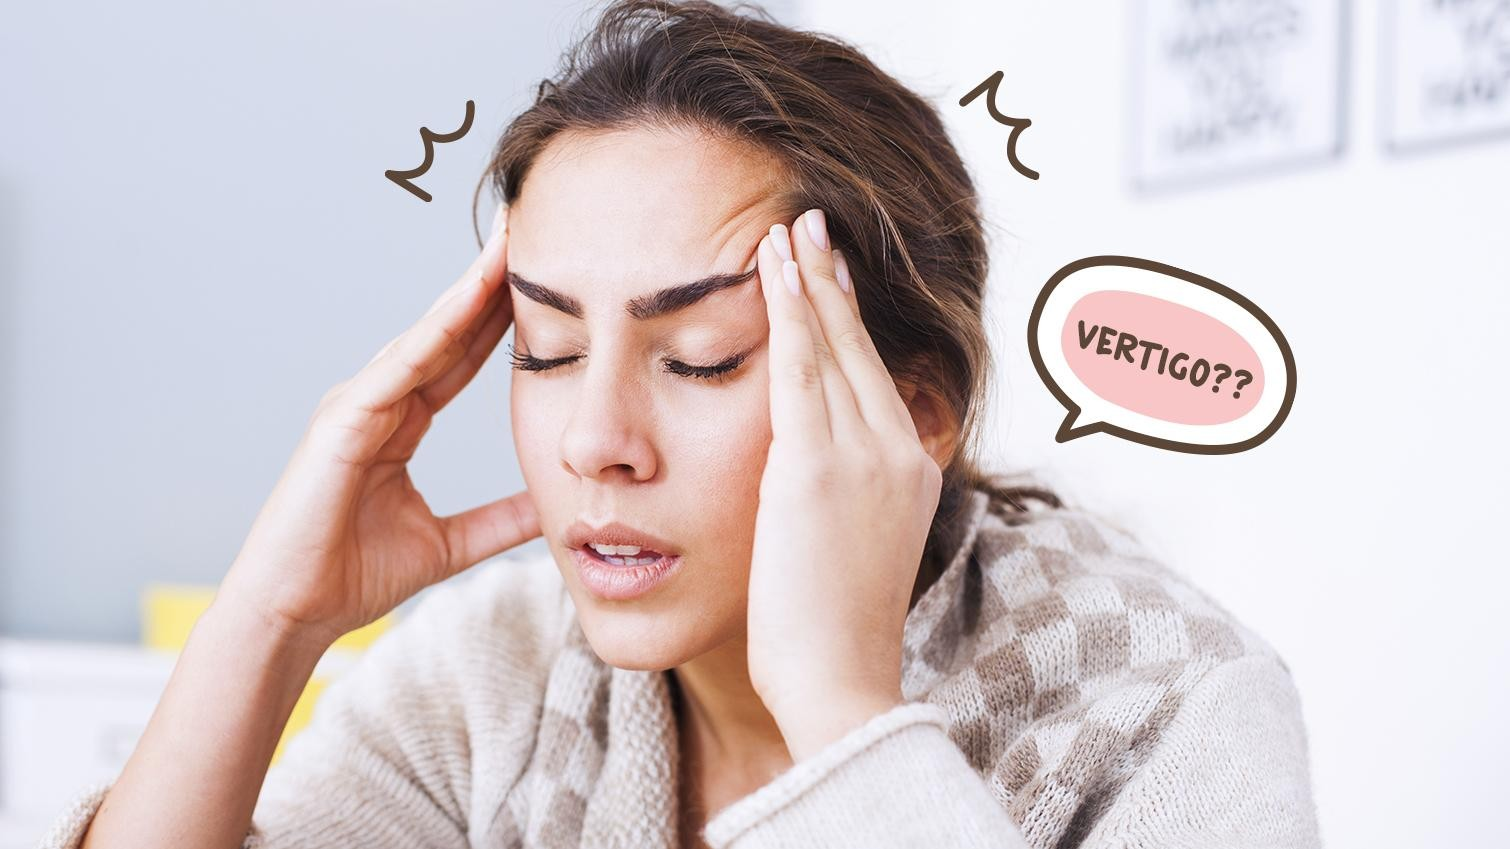 Vertigo: Penyebab, Gejala, dan Pencegahannya